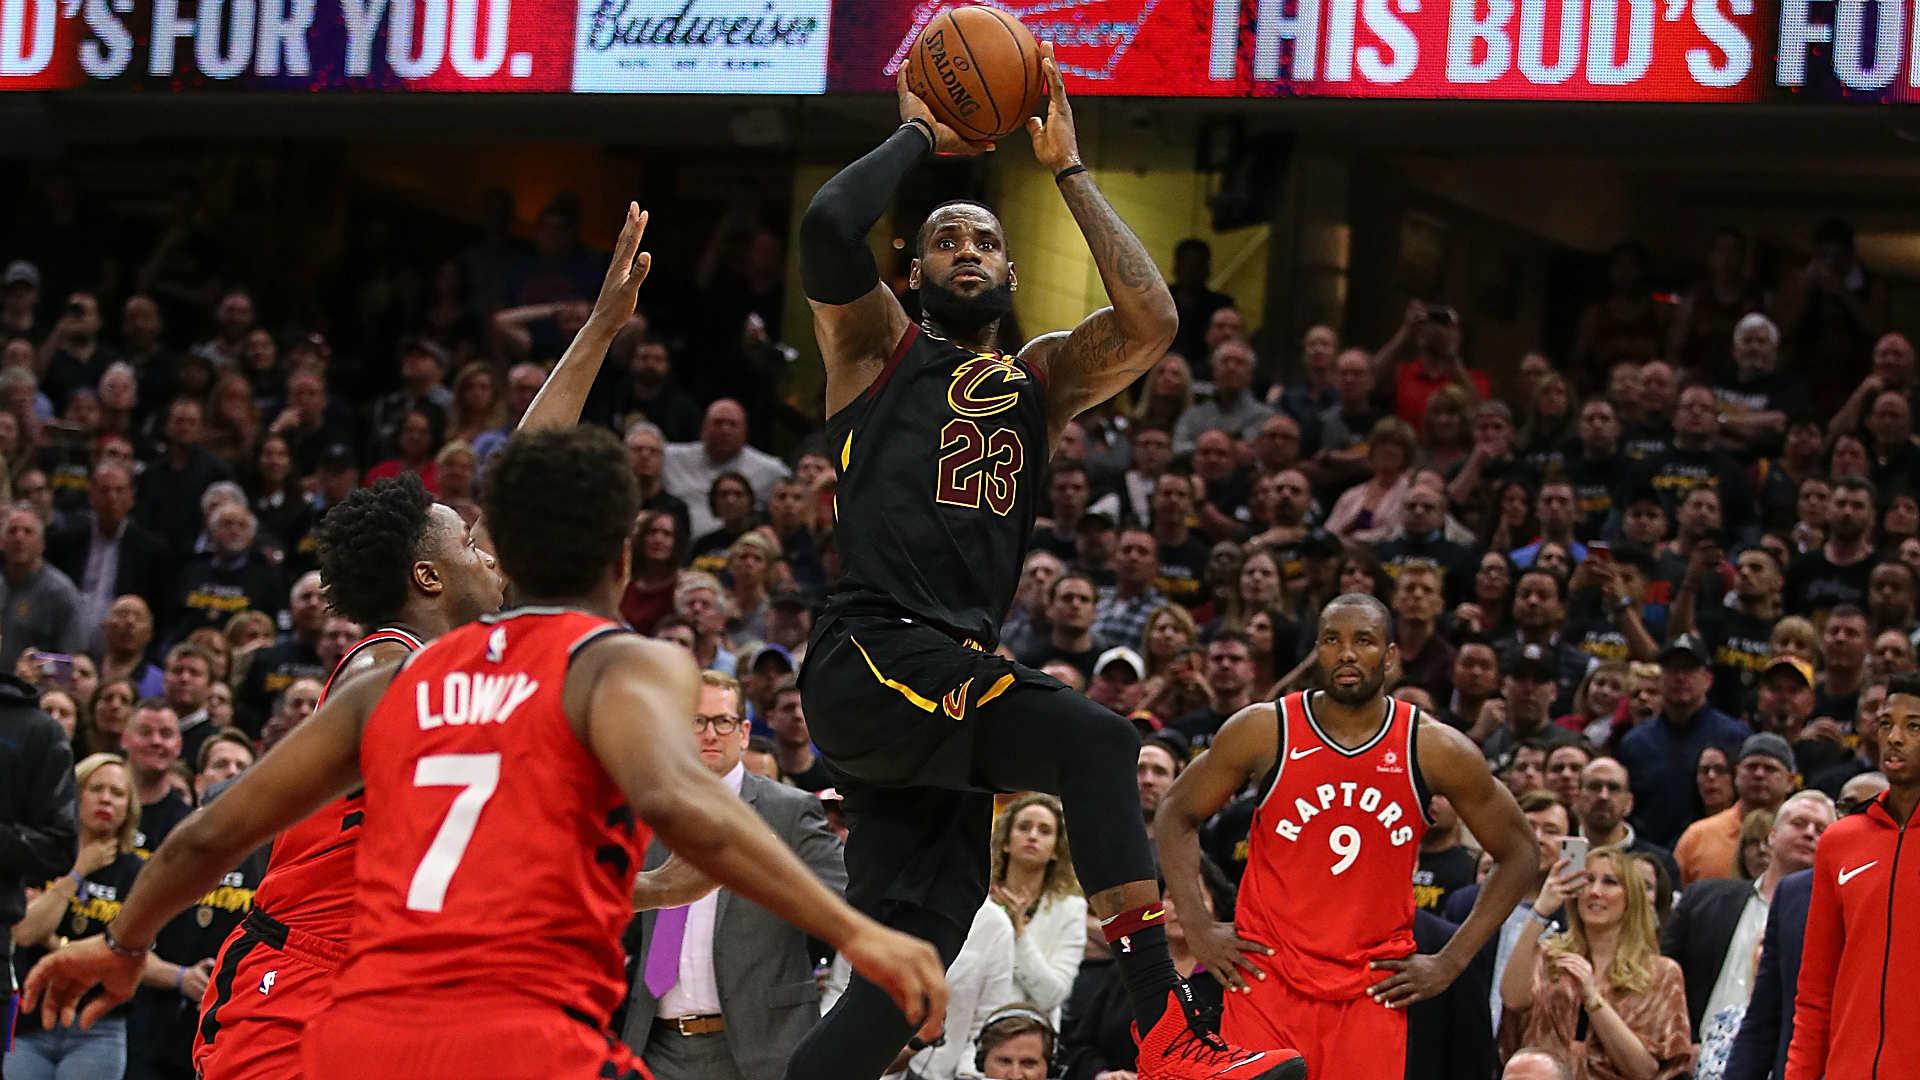 LeBron James' game-winner vs. Raptors causes Twitter frenzy among NBA stars | NBA | Sporting News